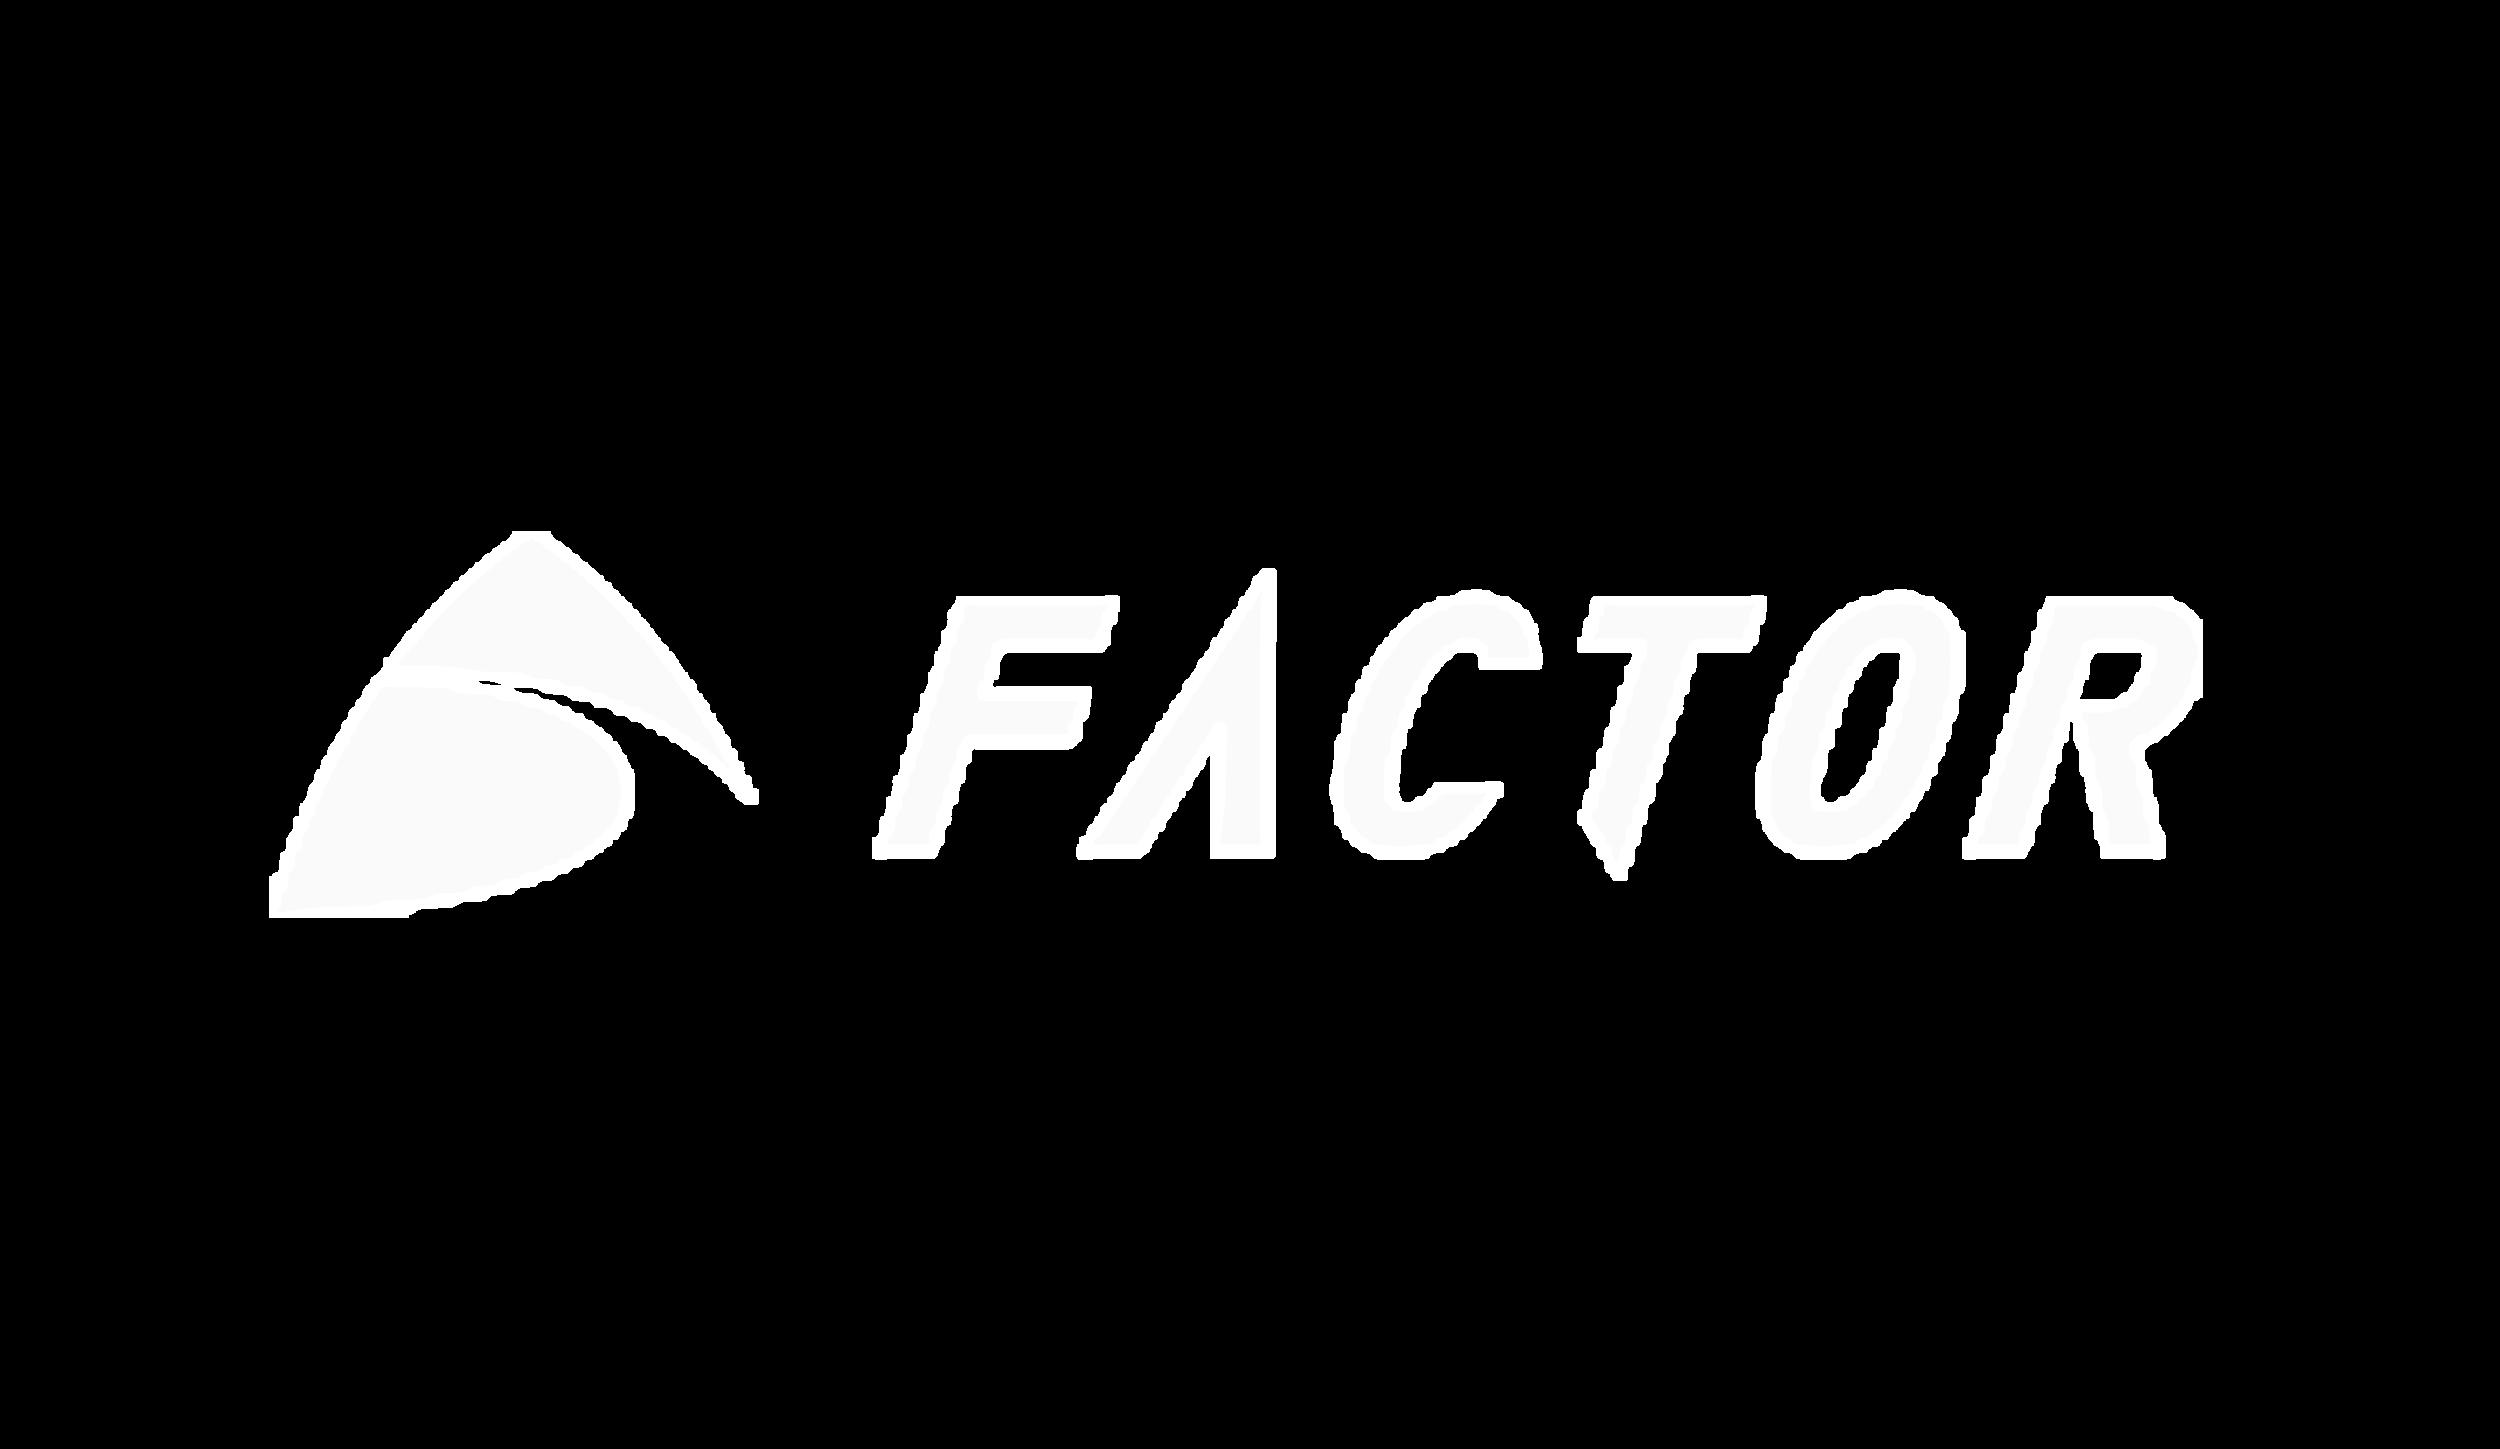 logos-Template_Bell_Lap_0000s_0016_Factor-Bikes.png